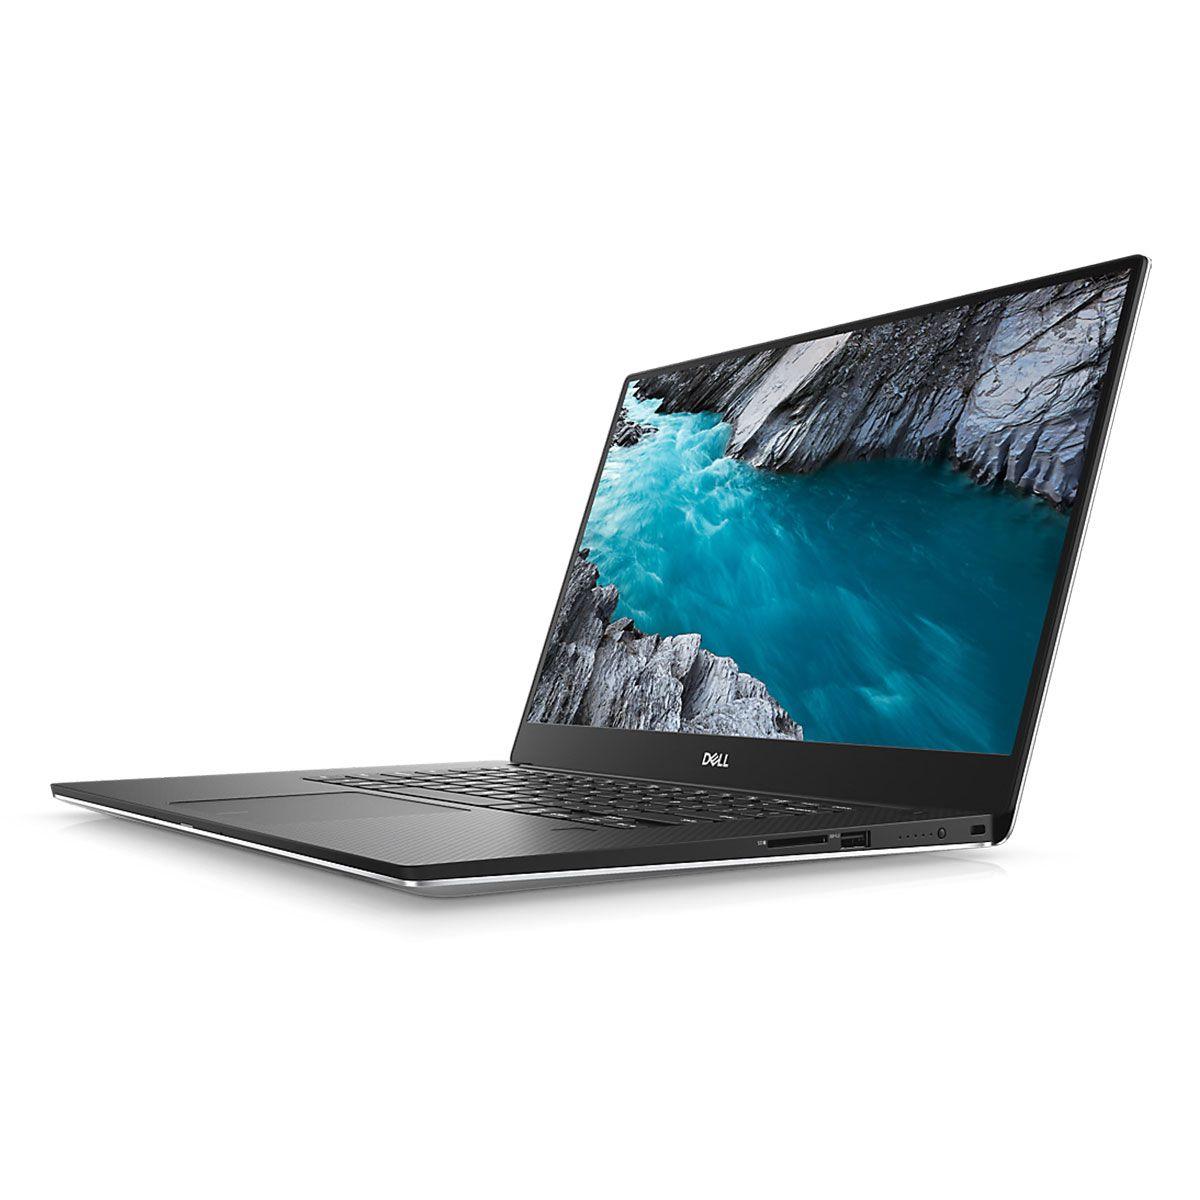 Eofy 2020 Laptop Deals In Australia Save A Packet On A Powerhouse Device Techradar